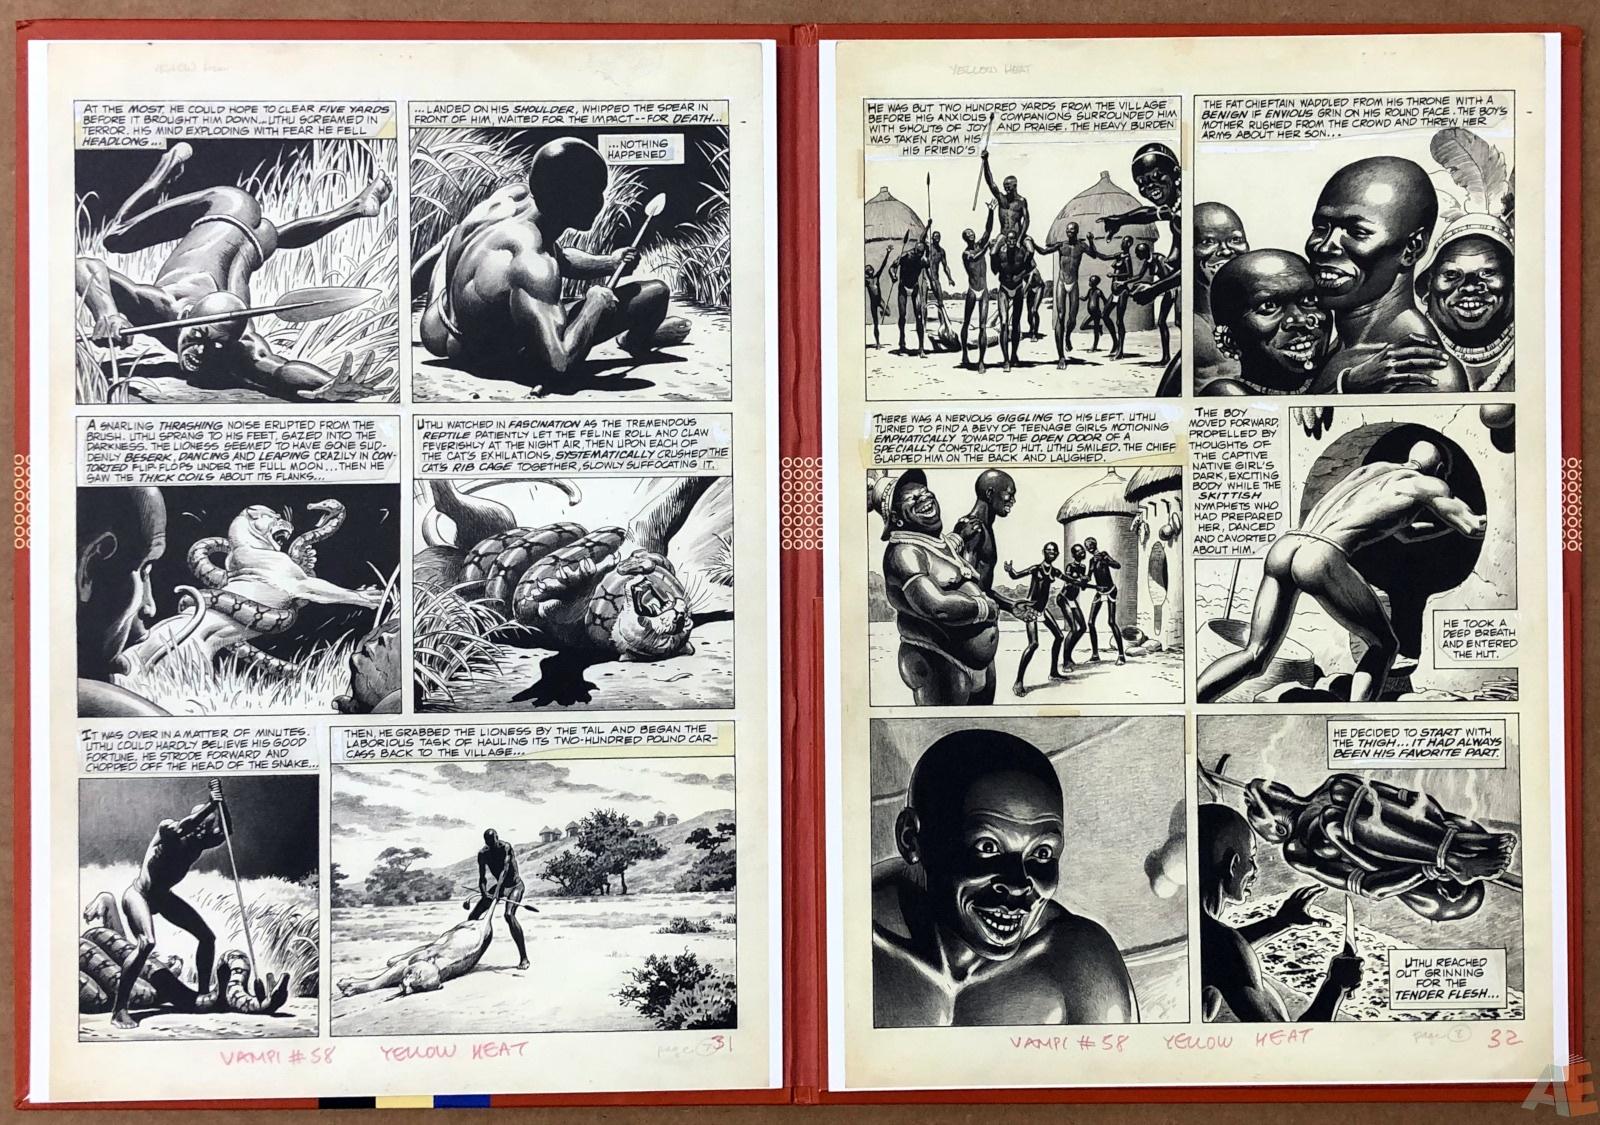 Russ Heath's Yellow Heat Artist's Edition Portfolio 12